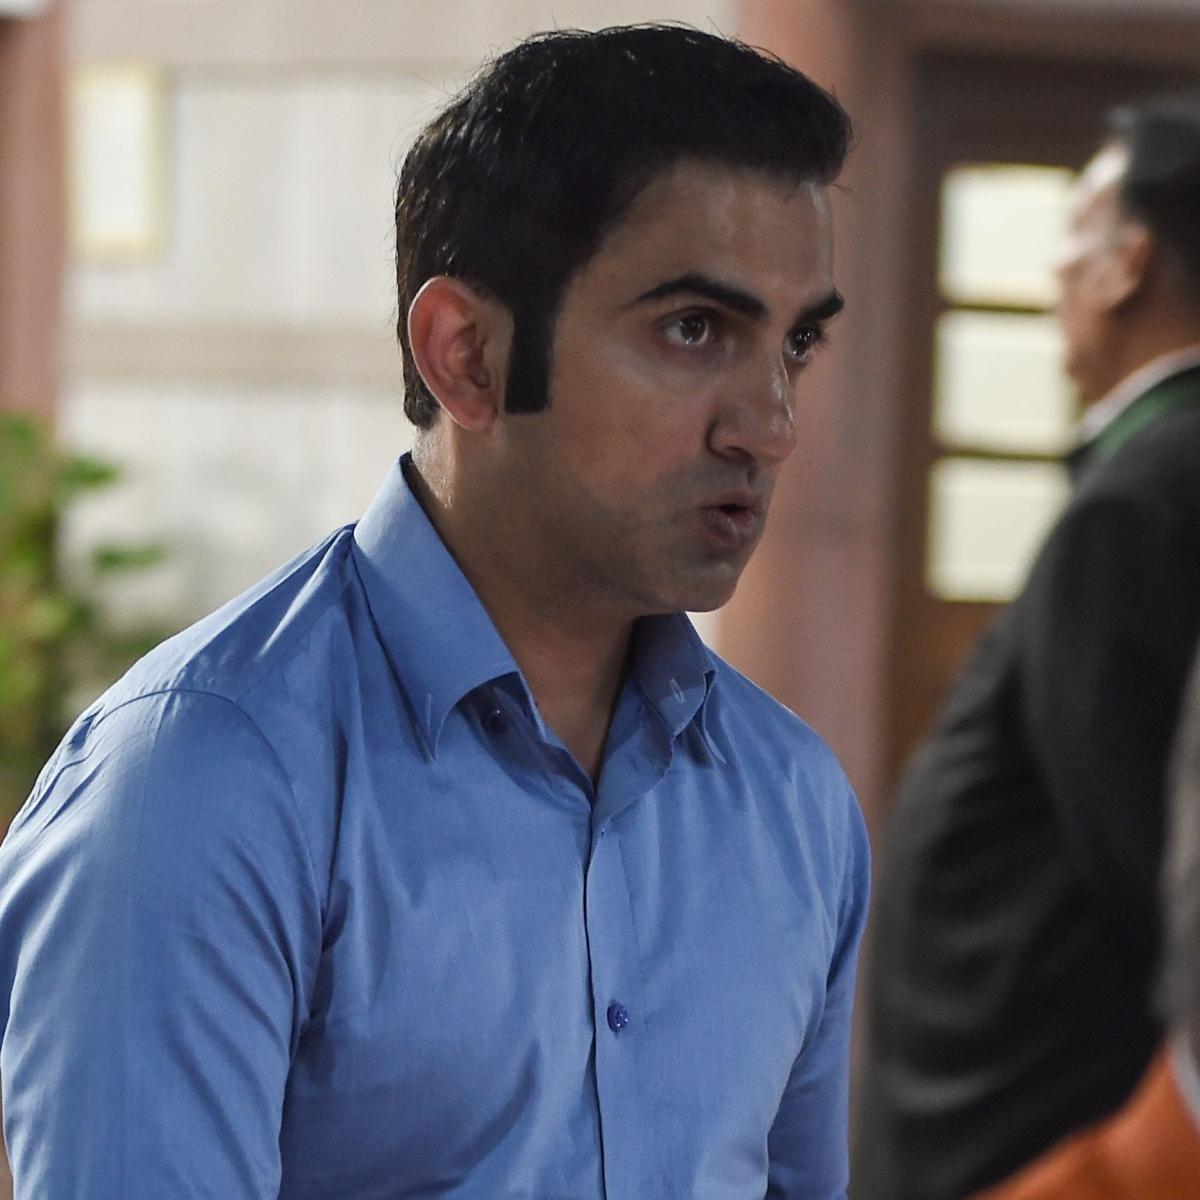 'Is it even legal?': Twitter reacts after Gautam Gambhir offers free 'Fabiflu' at his East Delhi office